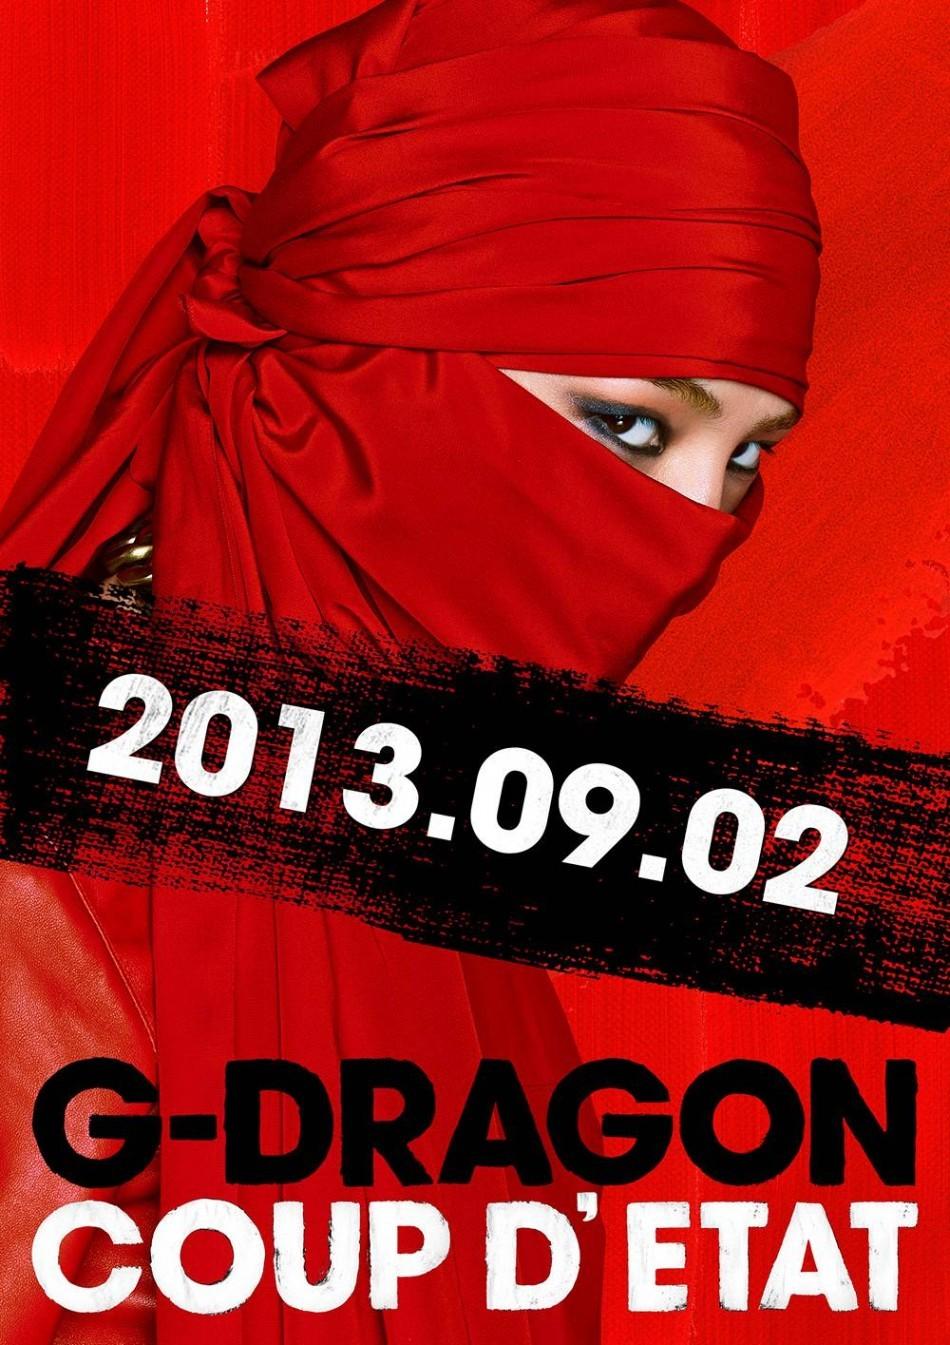 GDragon born Kwon Jiyong  쿠데타 COUP DETAT Pt 1  EP 2013 GD amp TOP 2010 Heartbreaker 2009 무한도전 영동고속도로 가요제  EP 2015